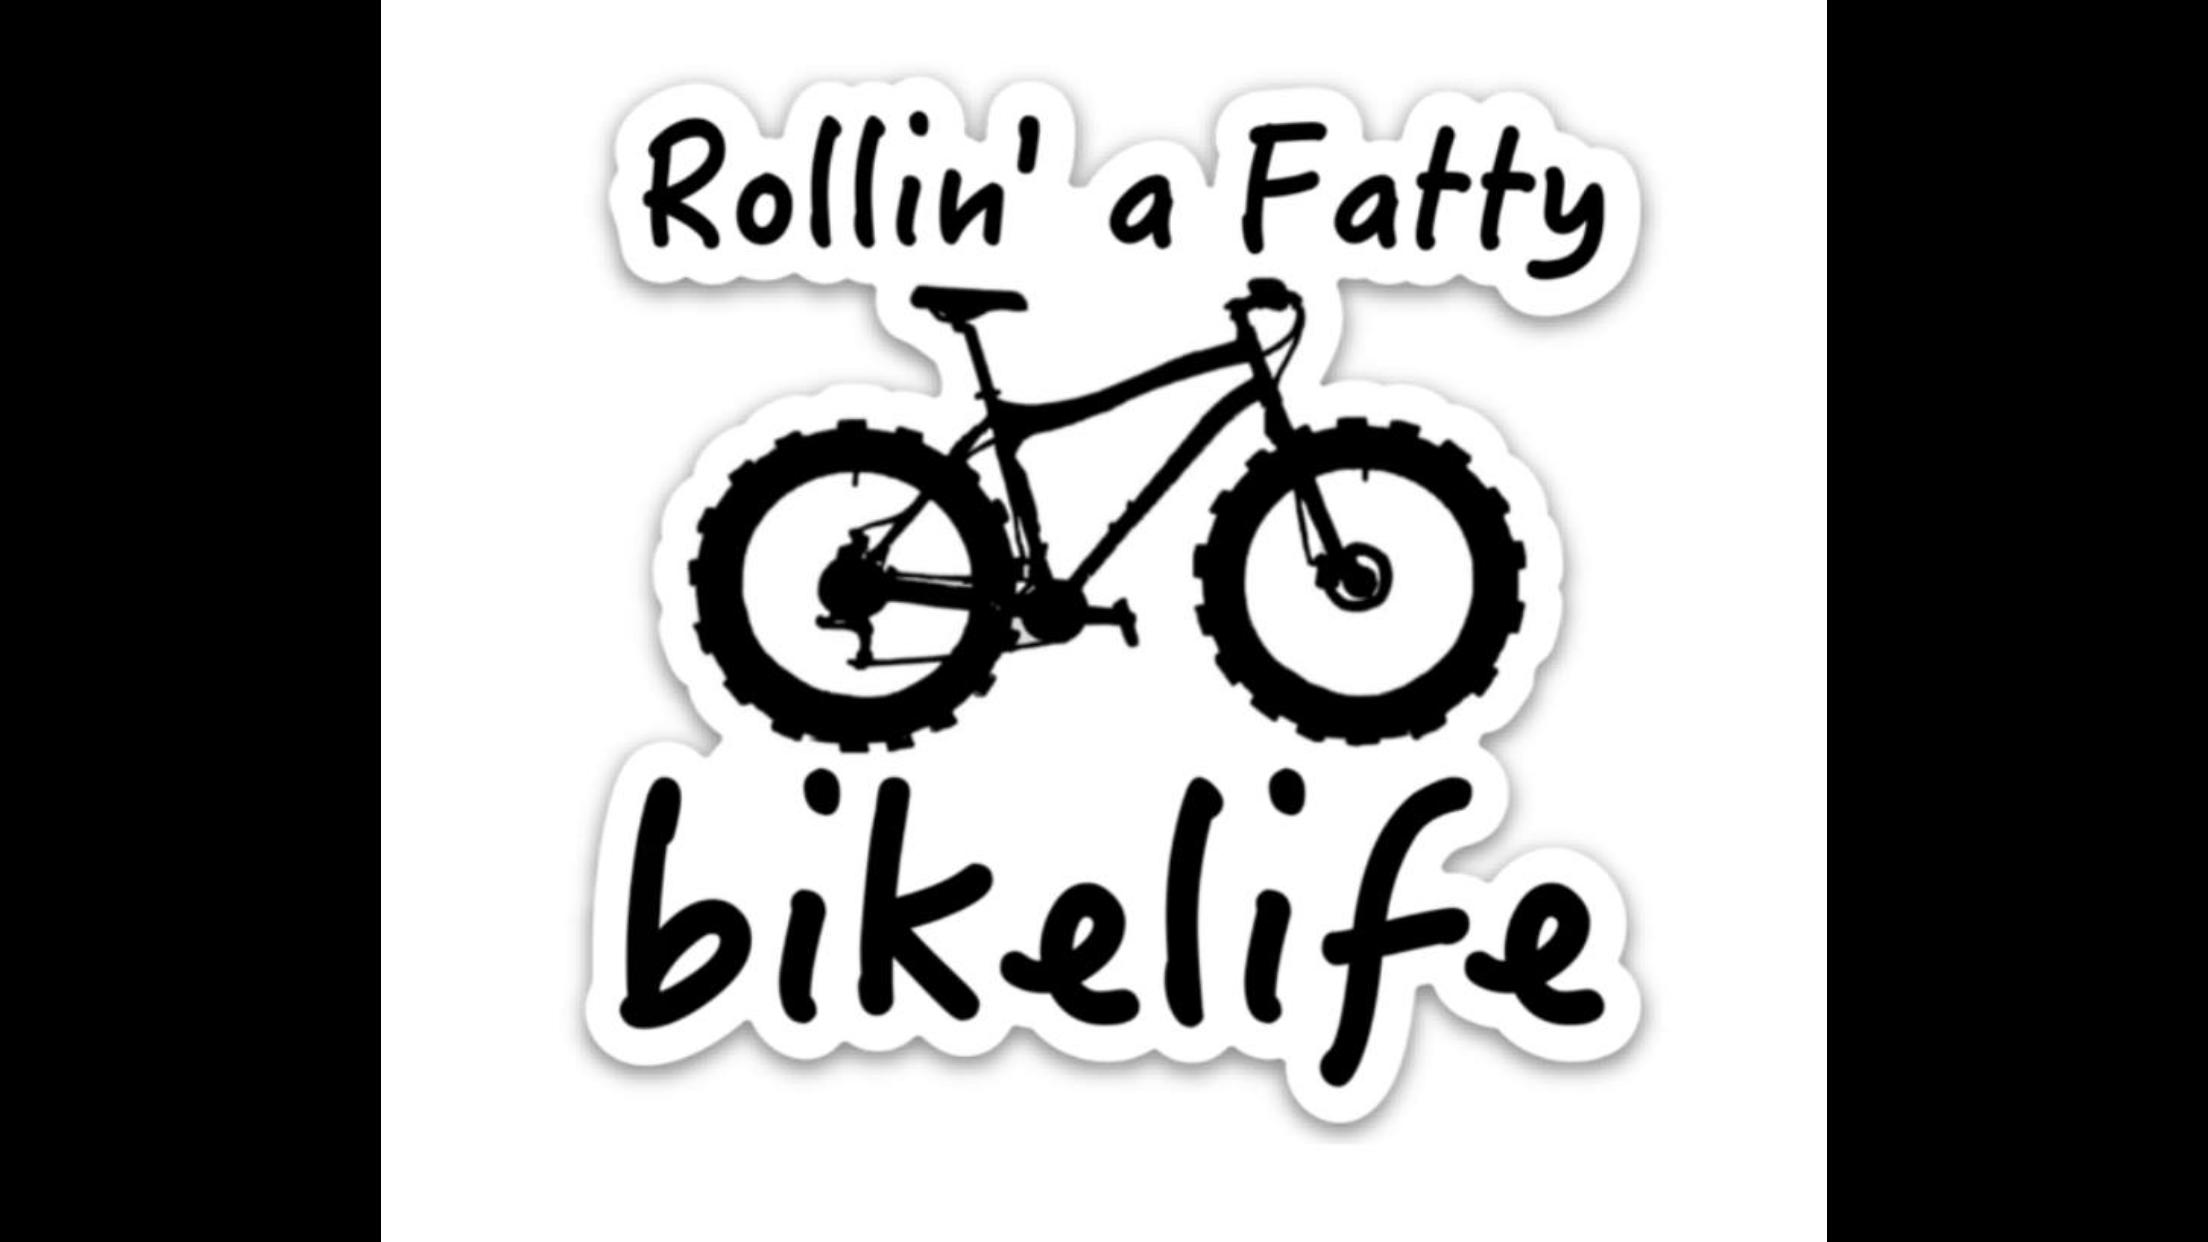 Rollin A Fatty Sticker Bike Life Bike Life Bike Stickers Bike [ 1242 x 2208 Pixel ]